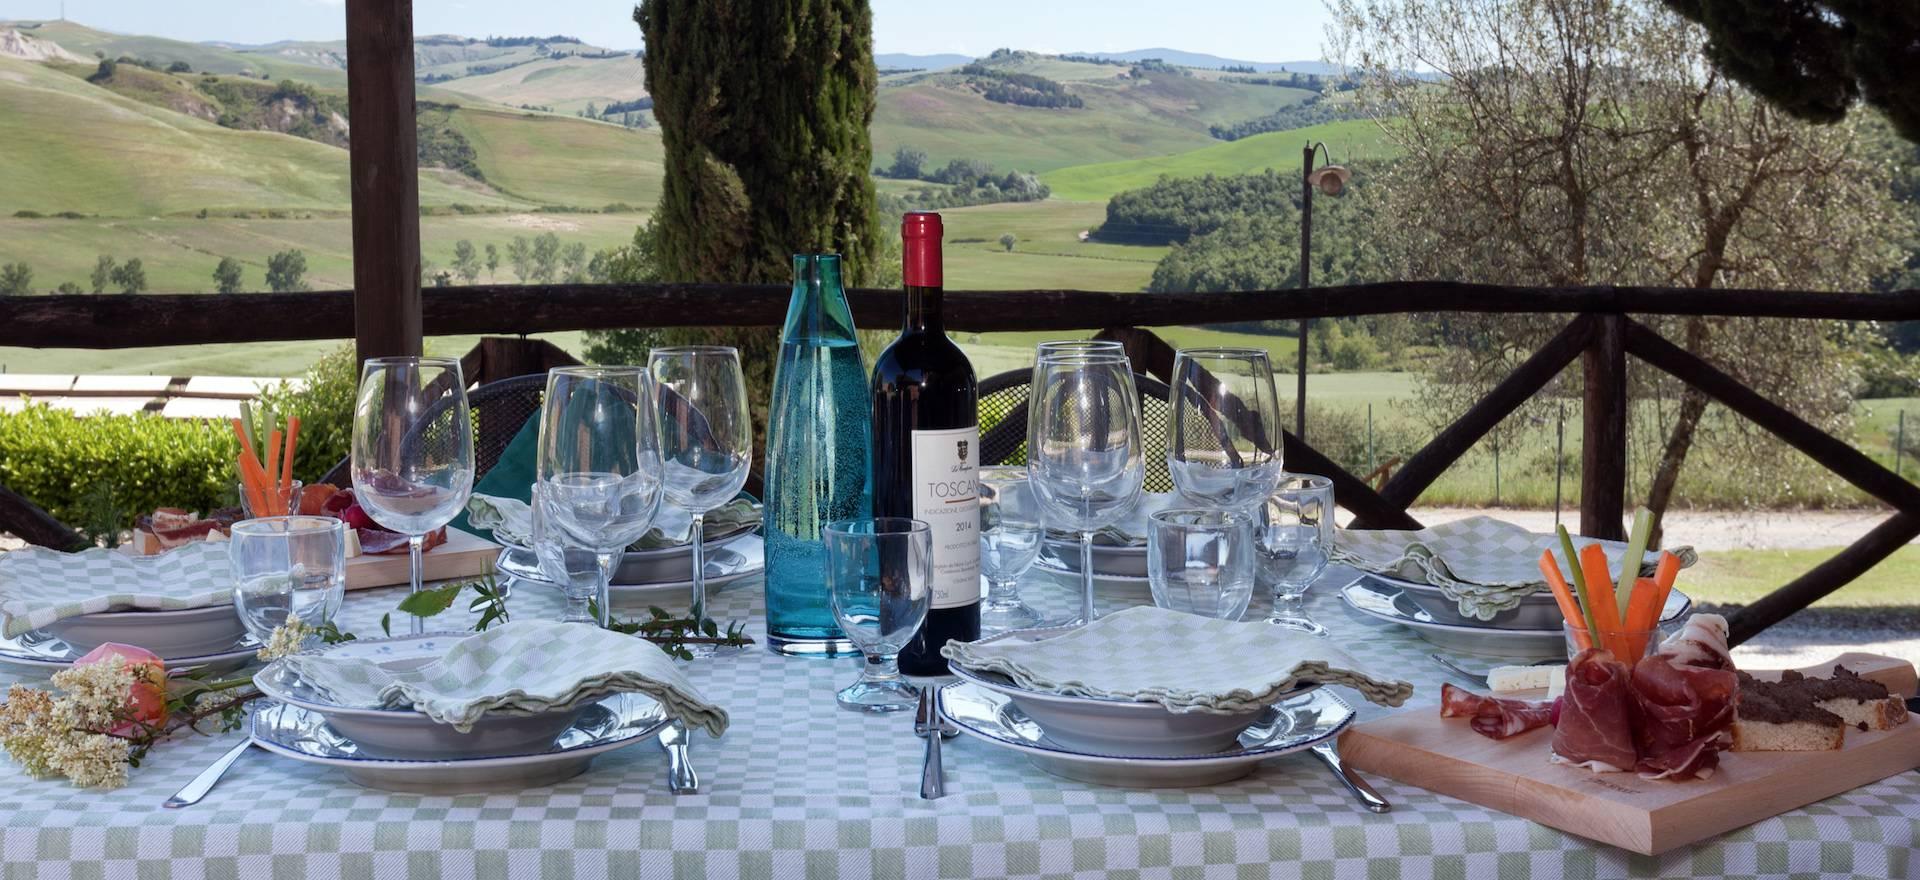 Agriturismo in Toscane met prachtig uitzicht